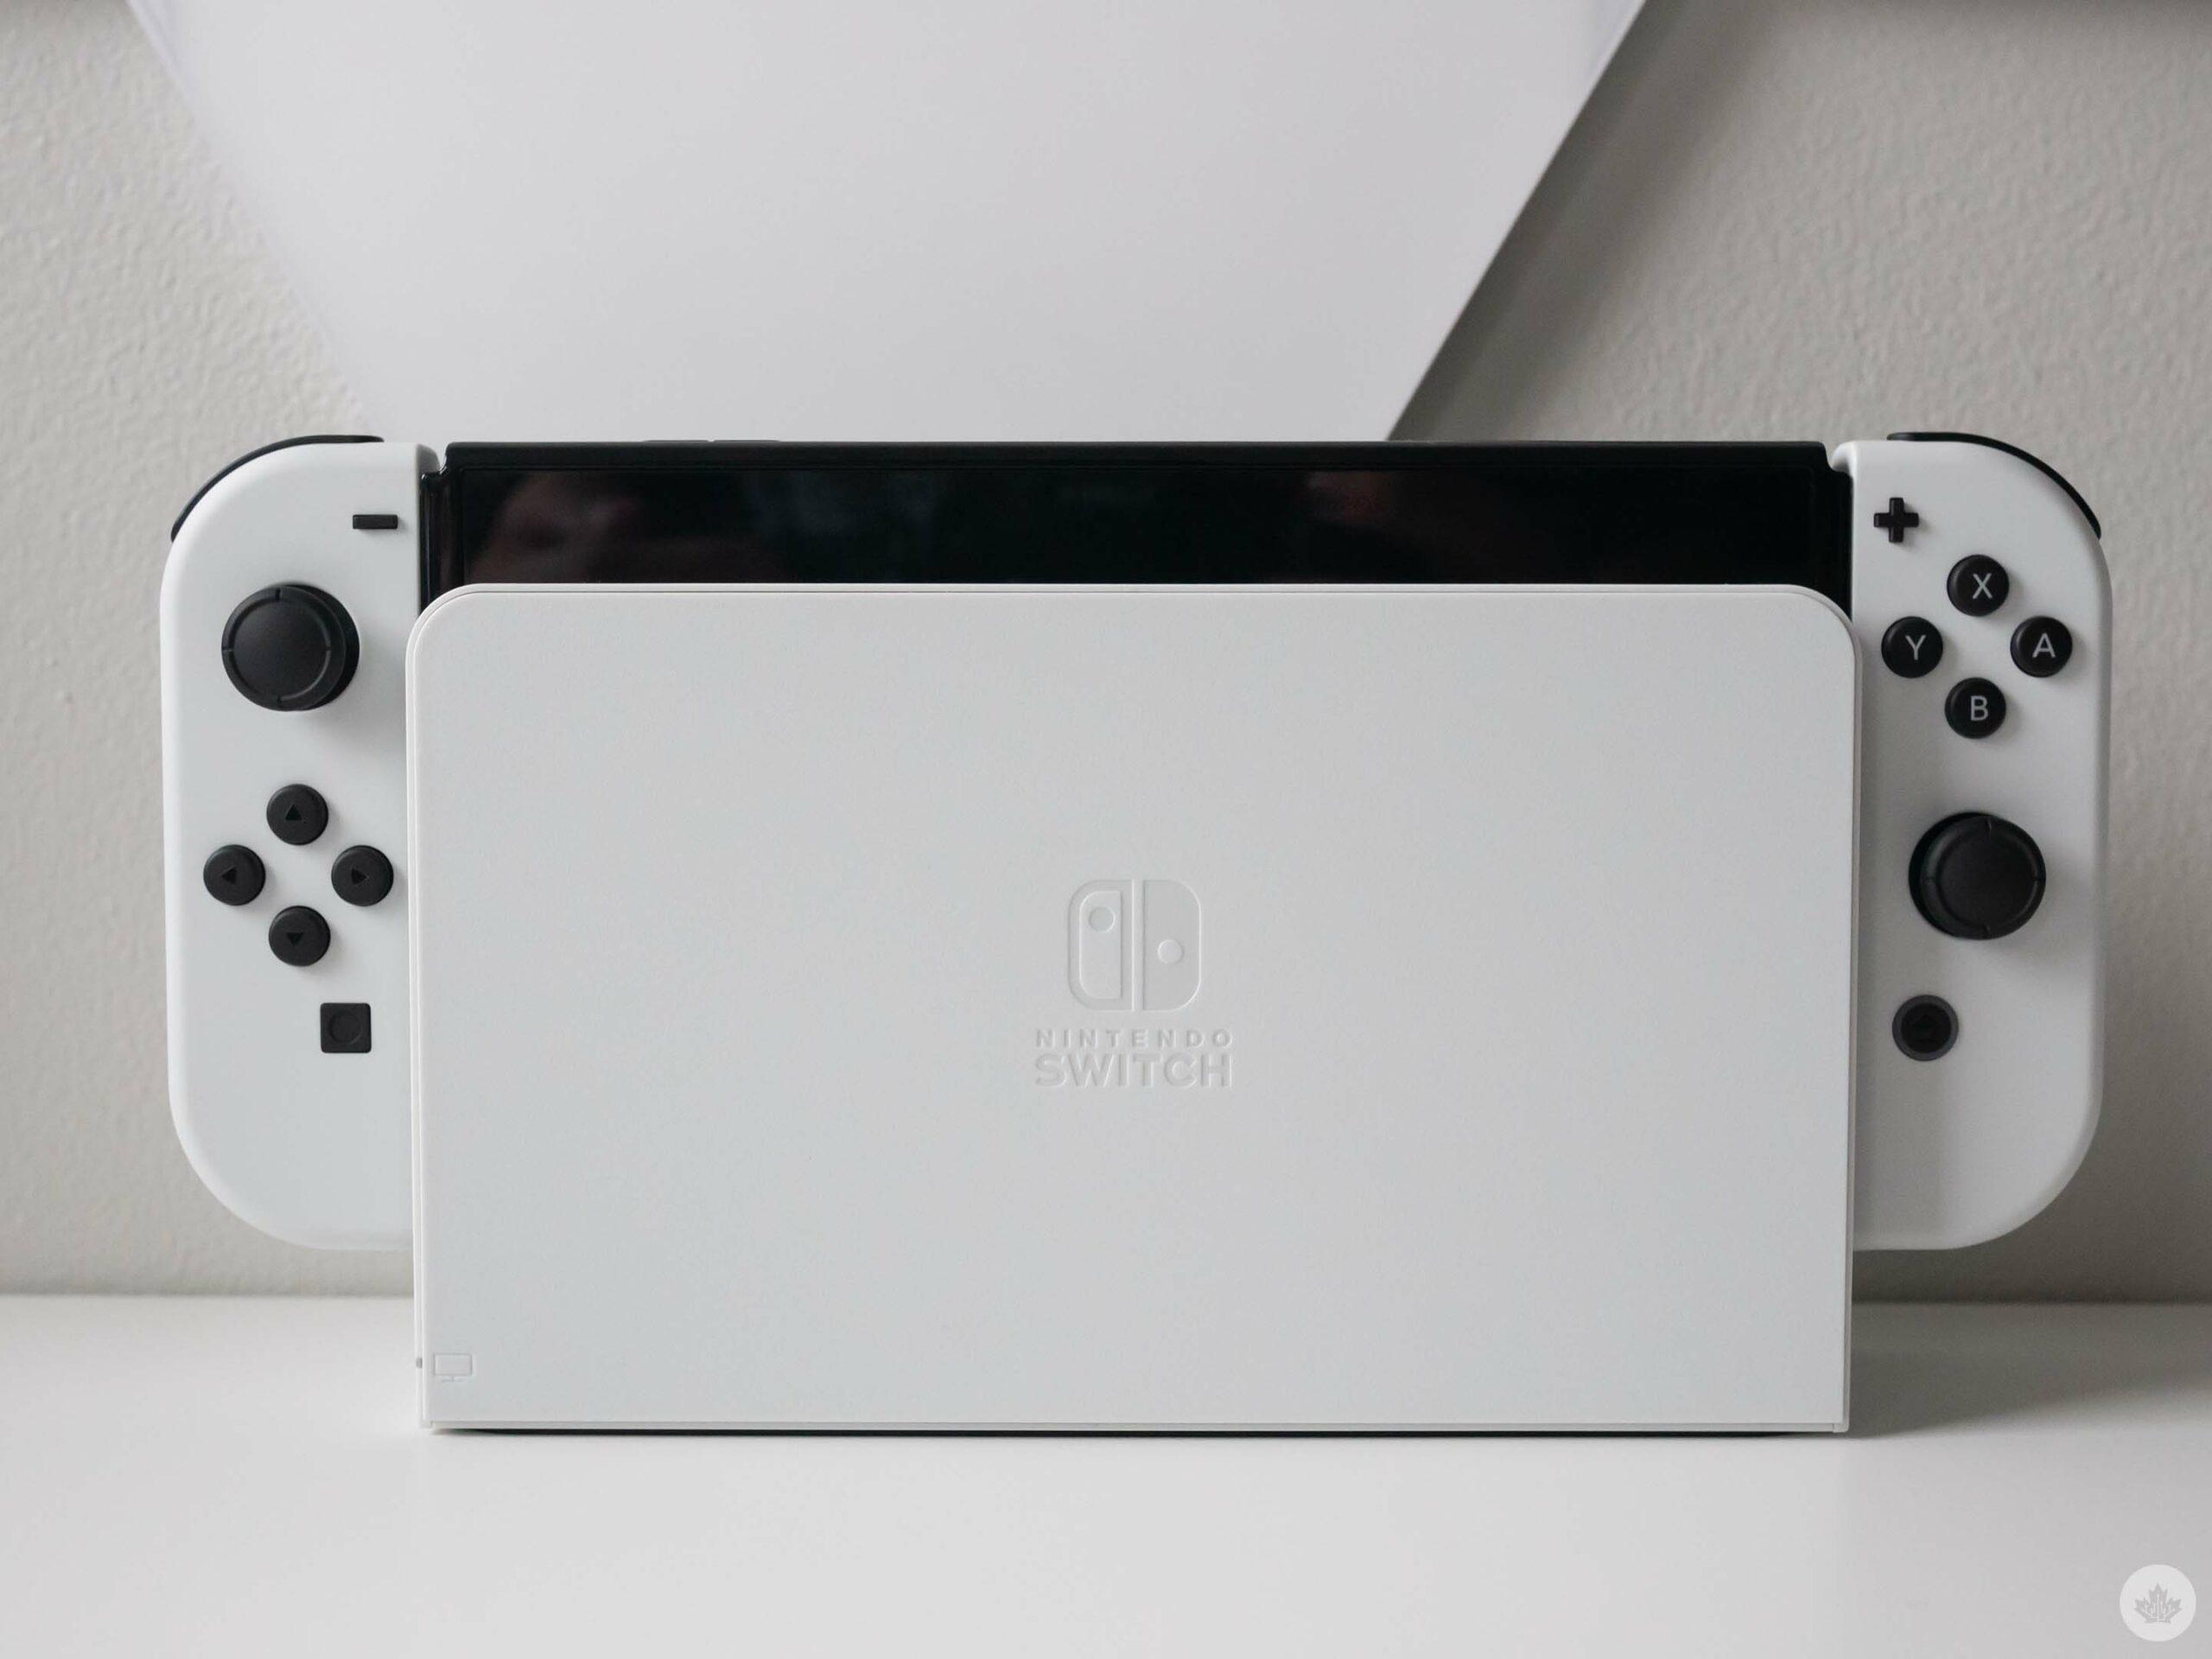 Switch OLED model